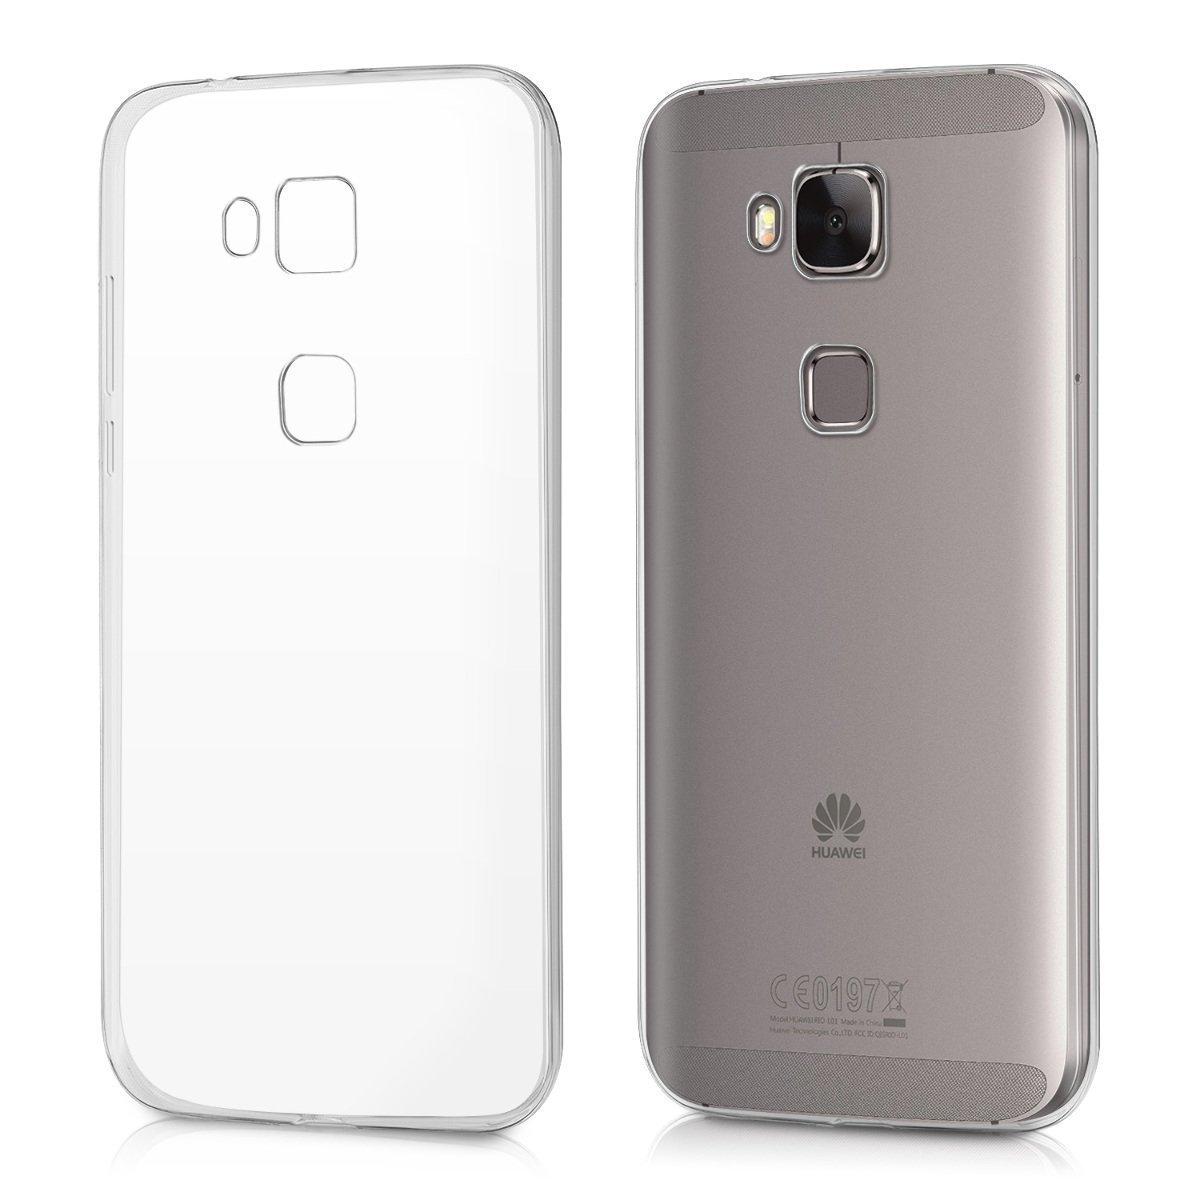 Mb Accesorios Funda Carcasa Gel Transparente para Huawei G8 GX8 ...